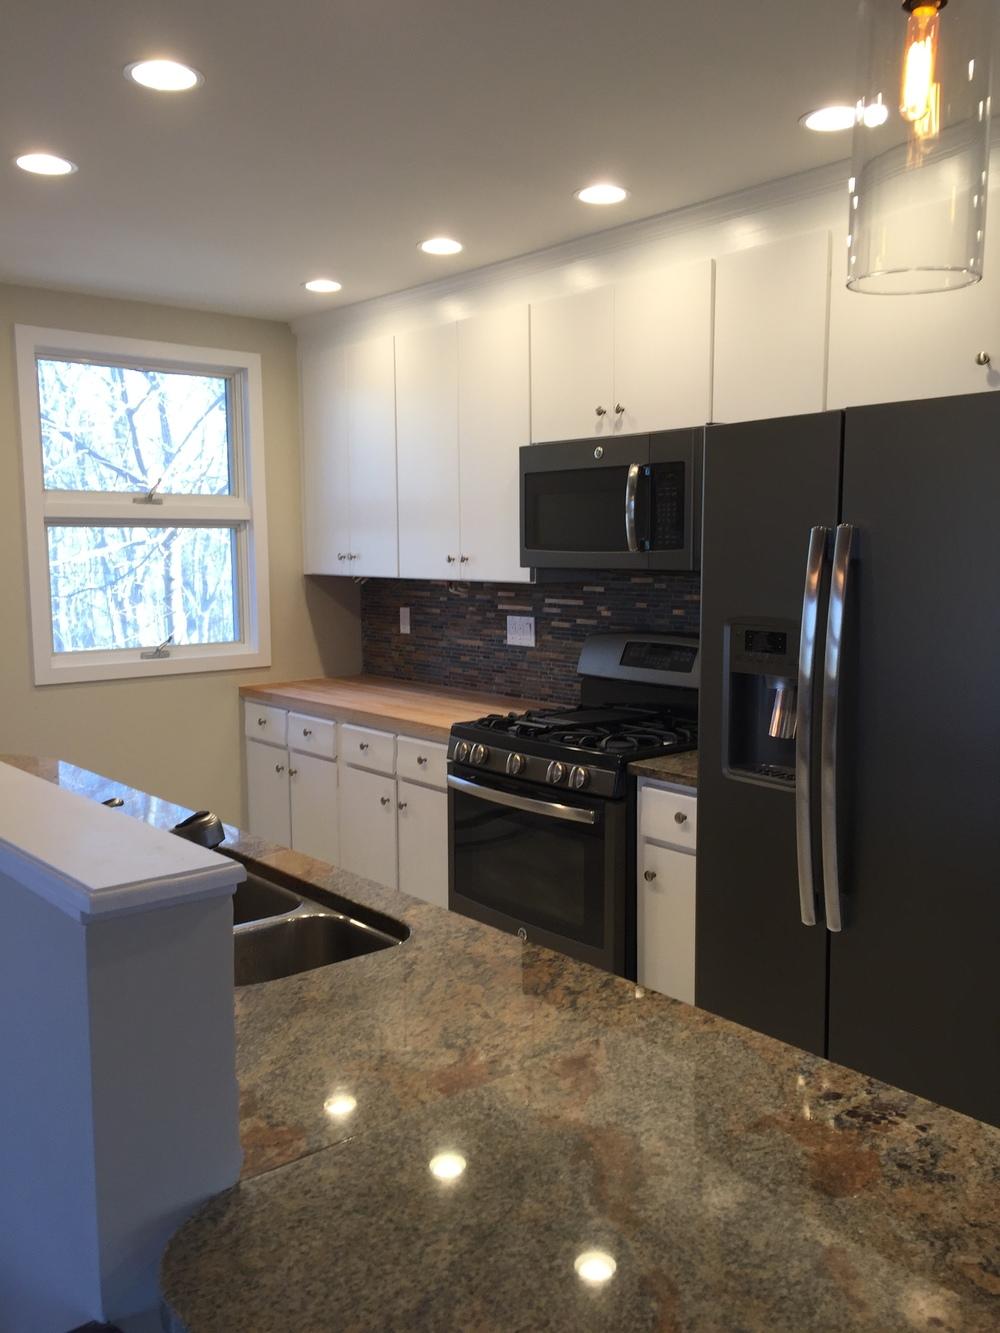 Shaw - Main Level Kitchen Remodel 224.JPG